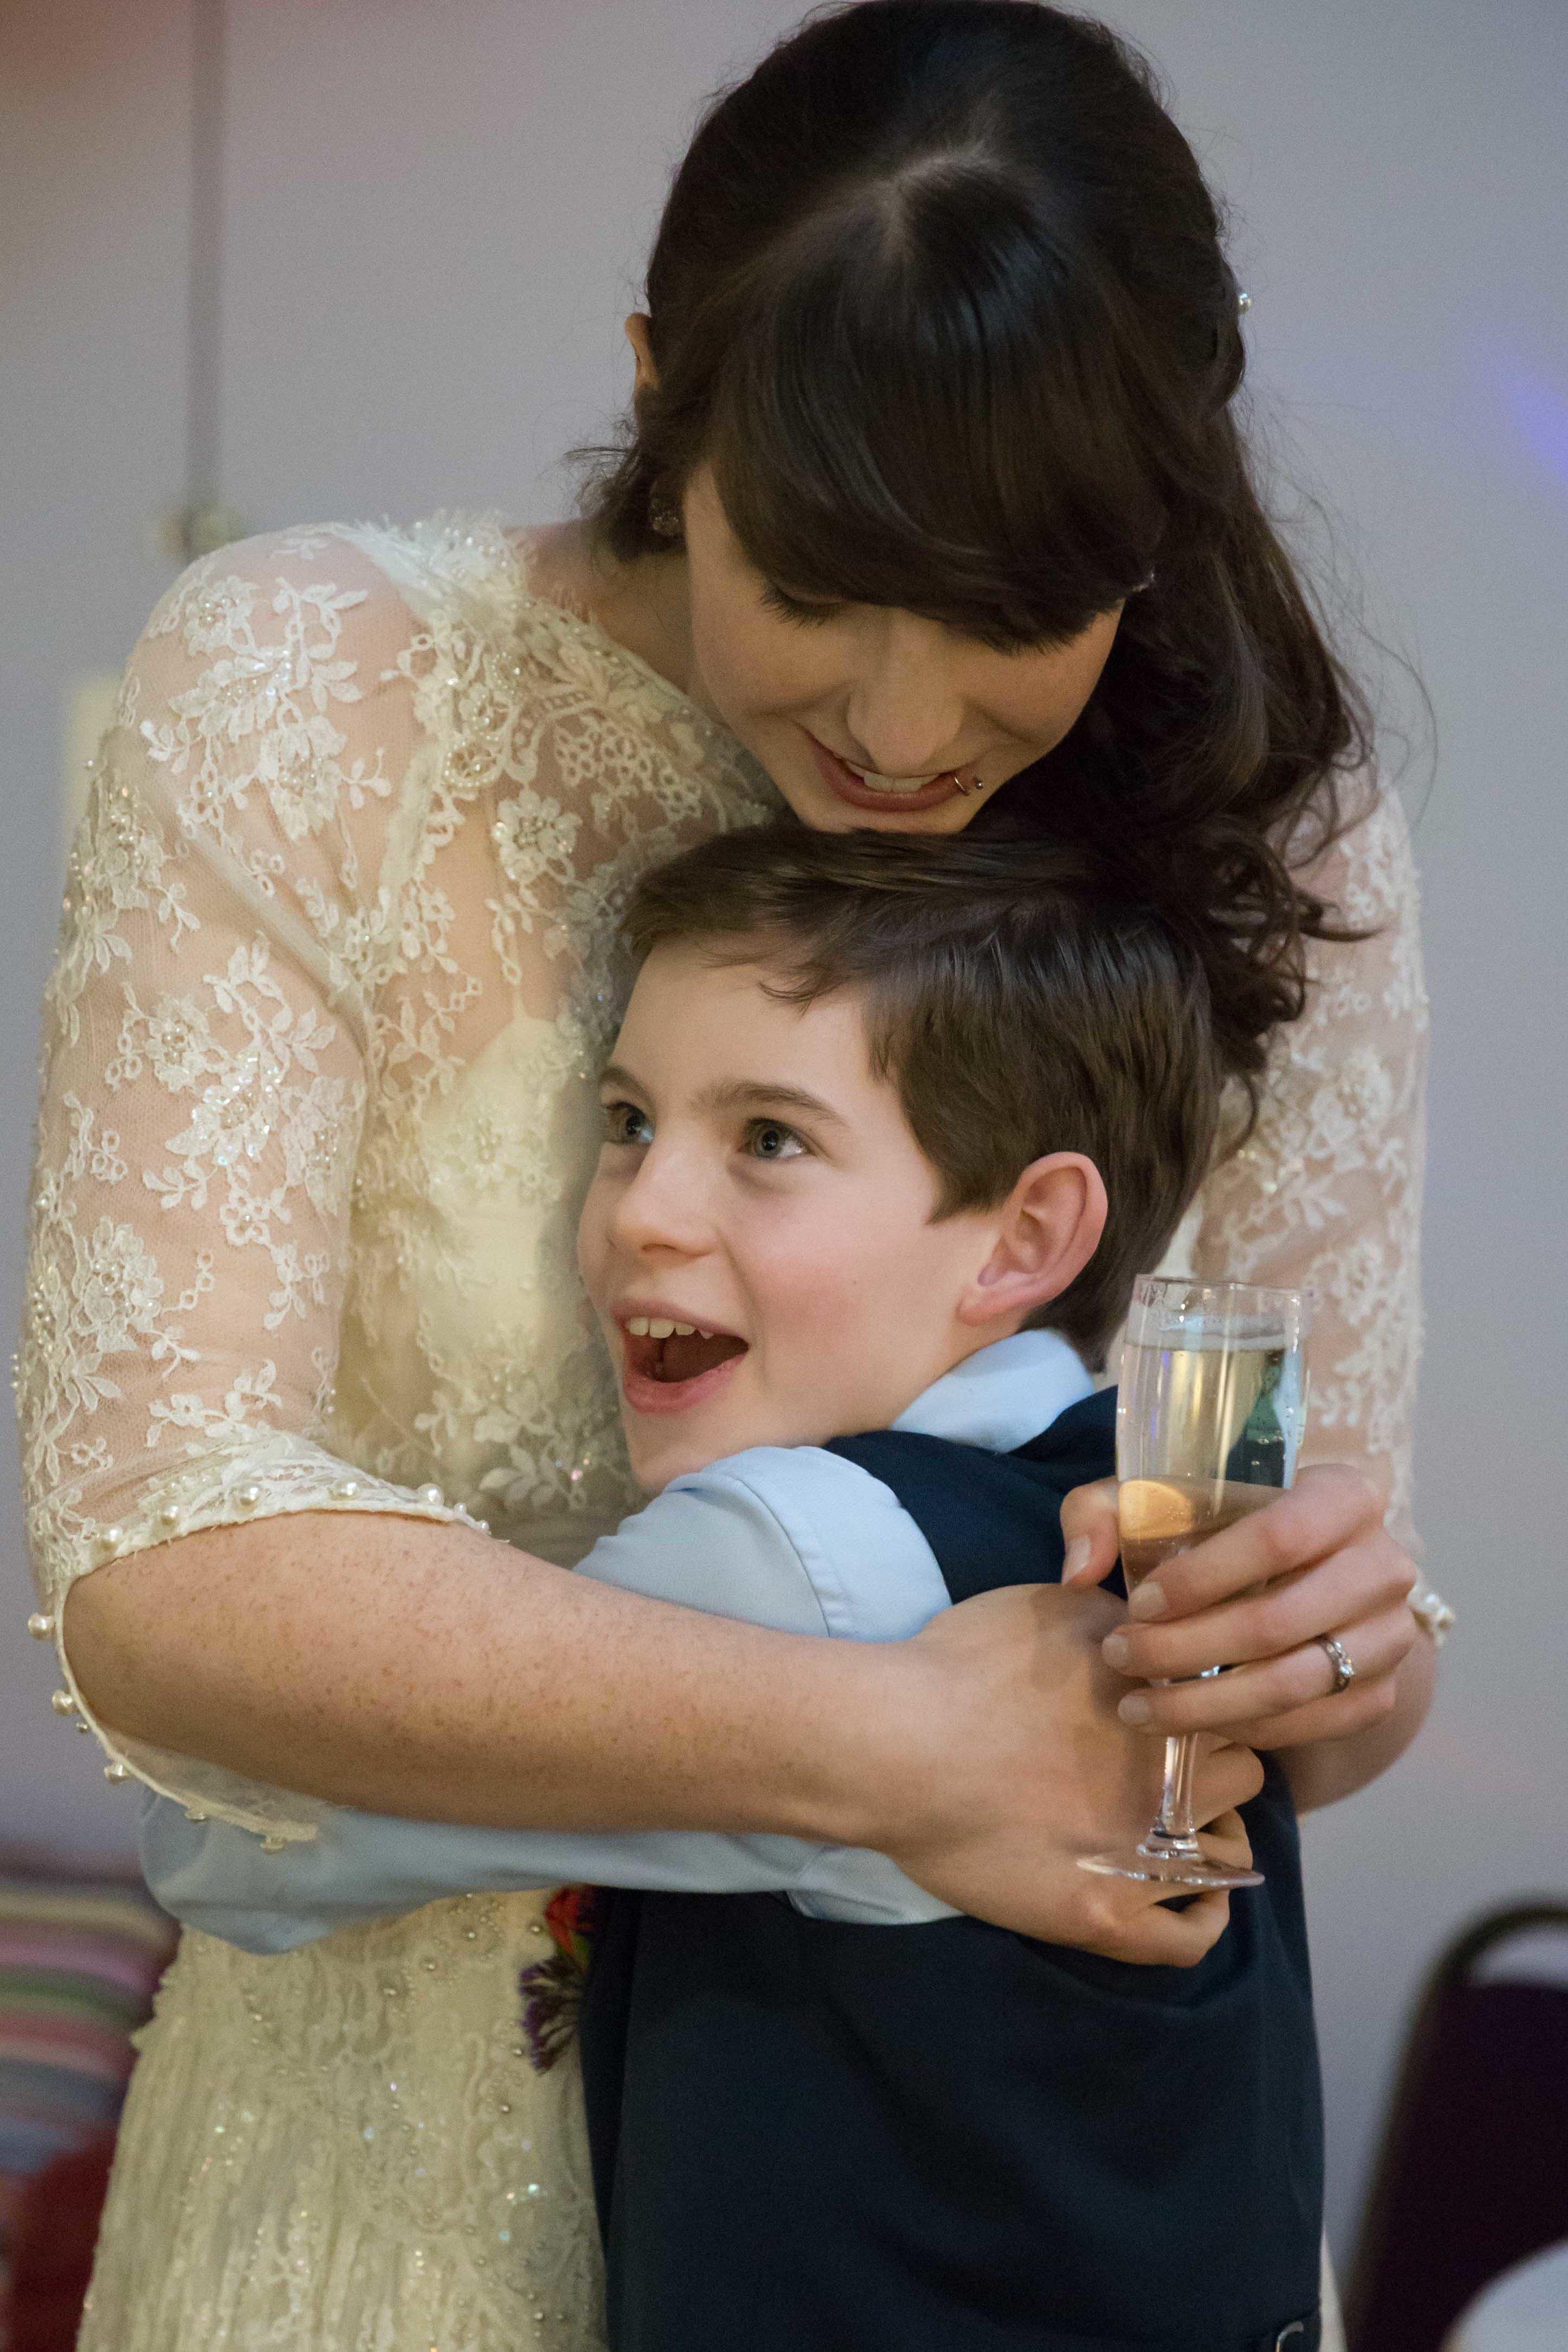 Adam & Faye - Wright Wedding Photography - Bristol Wedding Photographer -159.jpg